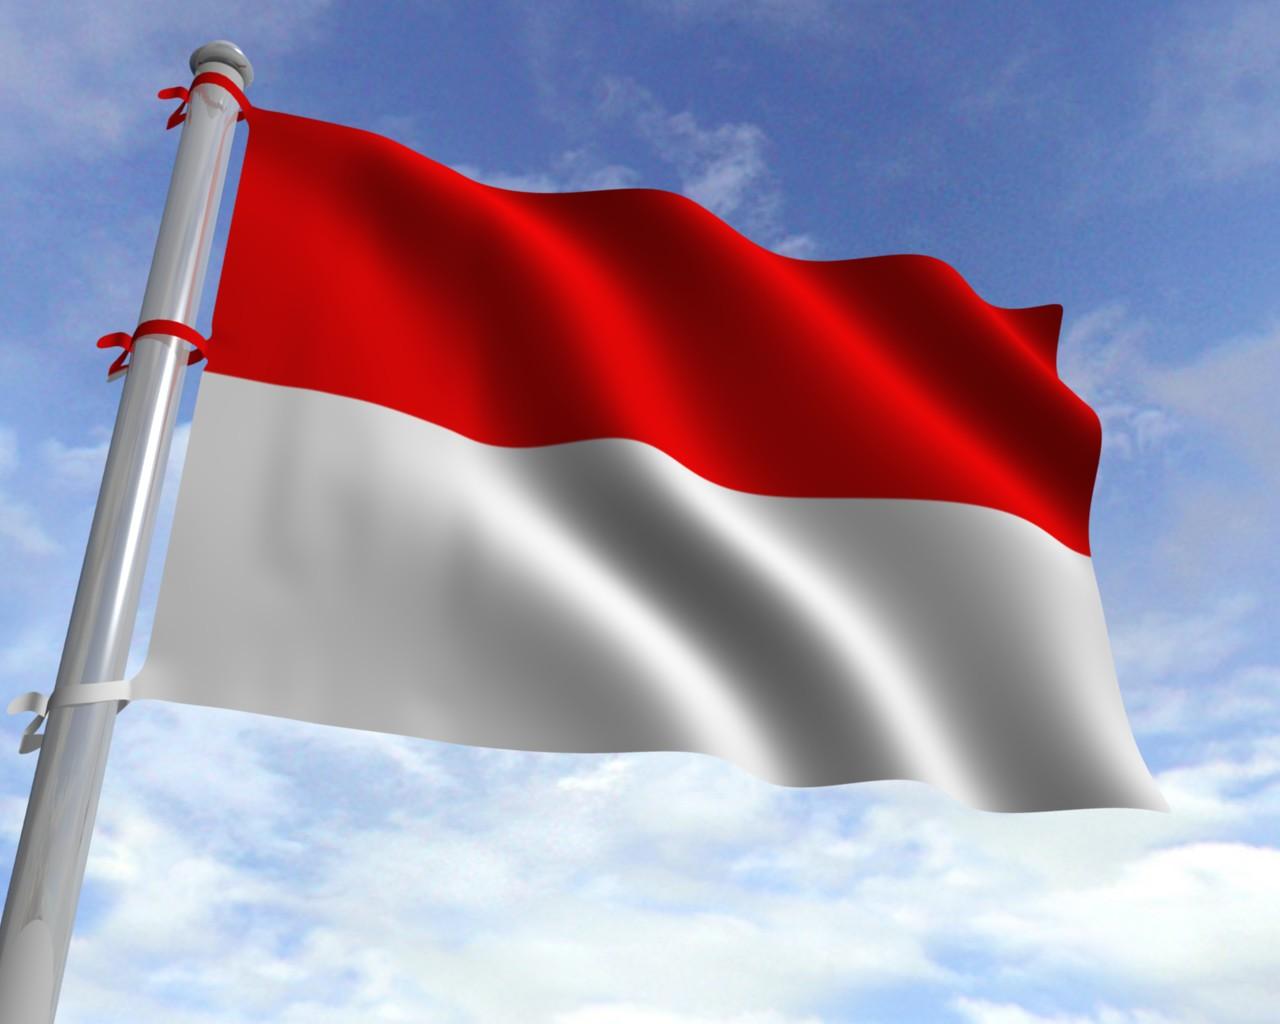 Indonesia announce moratorium on executions   FELICITY GERRY QC